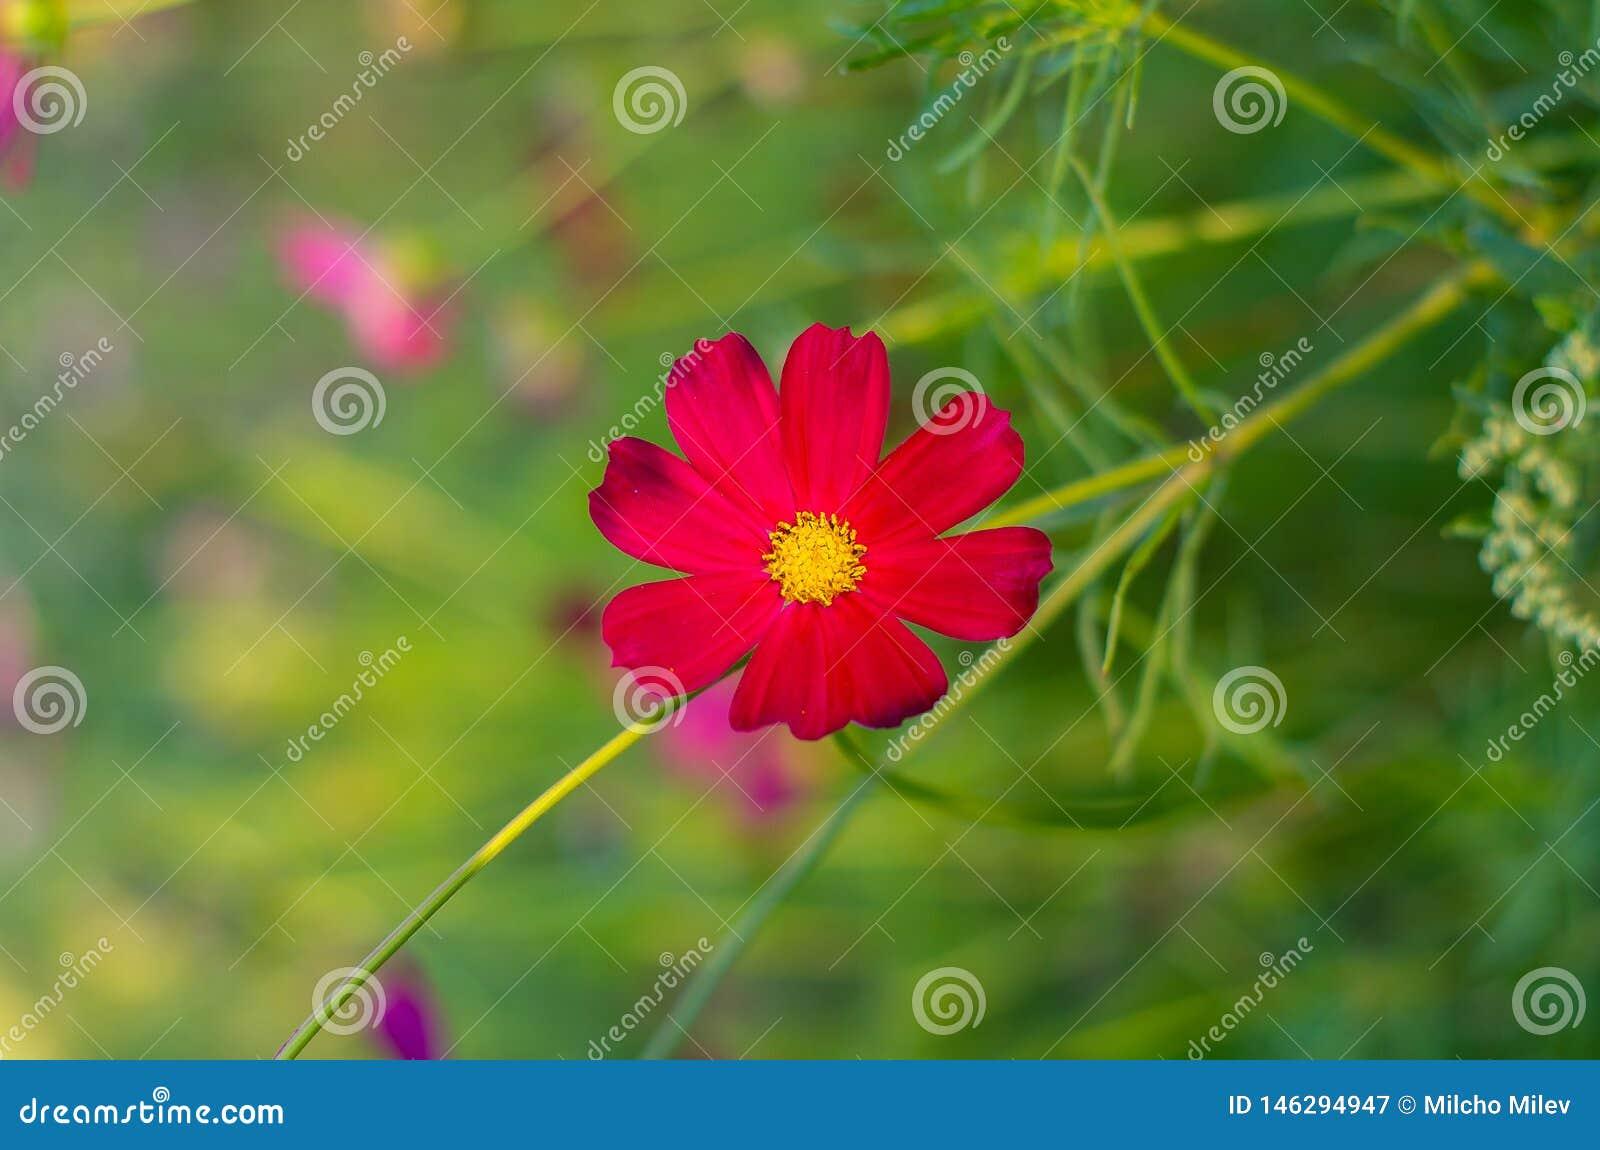 Red cosmos flowers garden. Cosmos flowers blooming in the garden